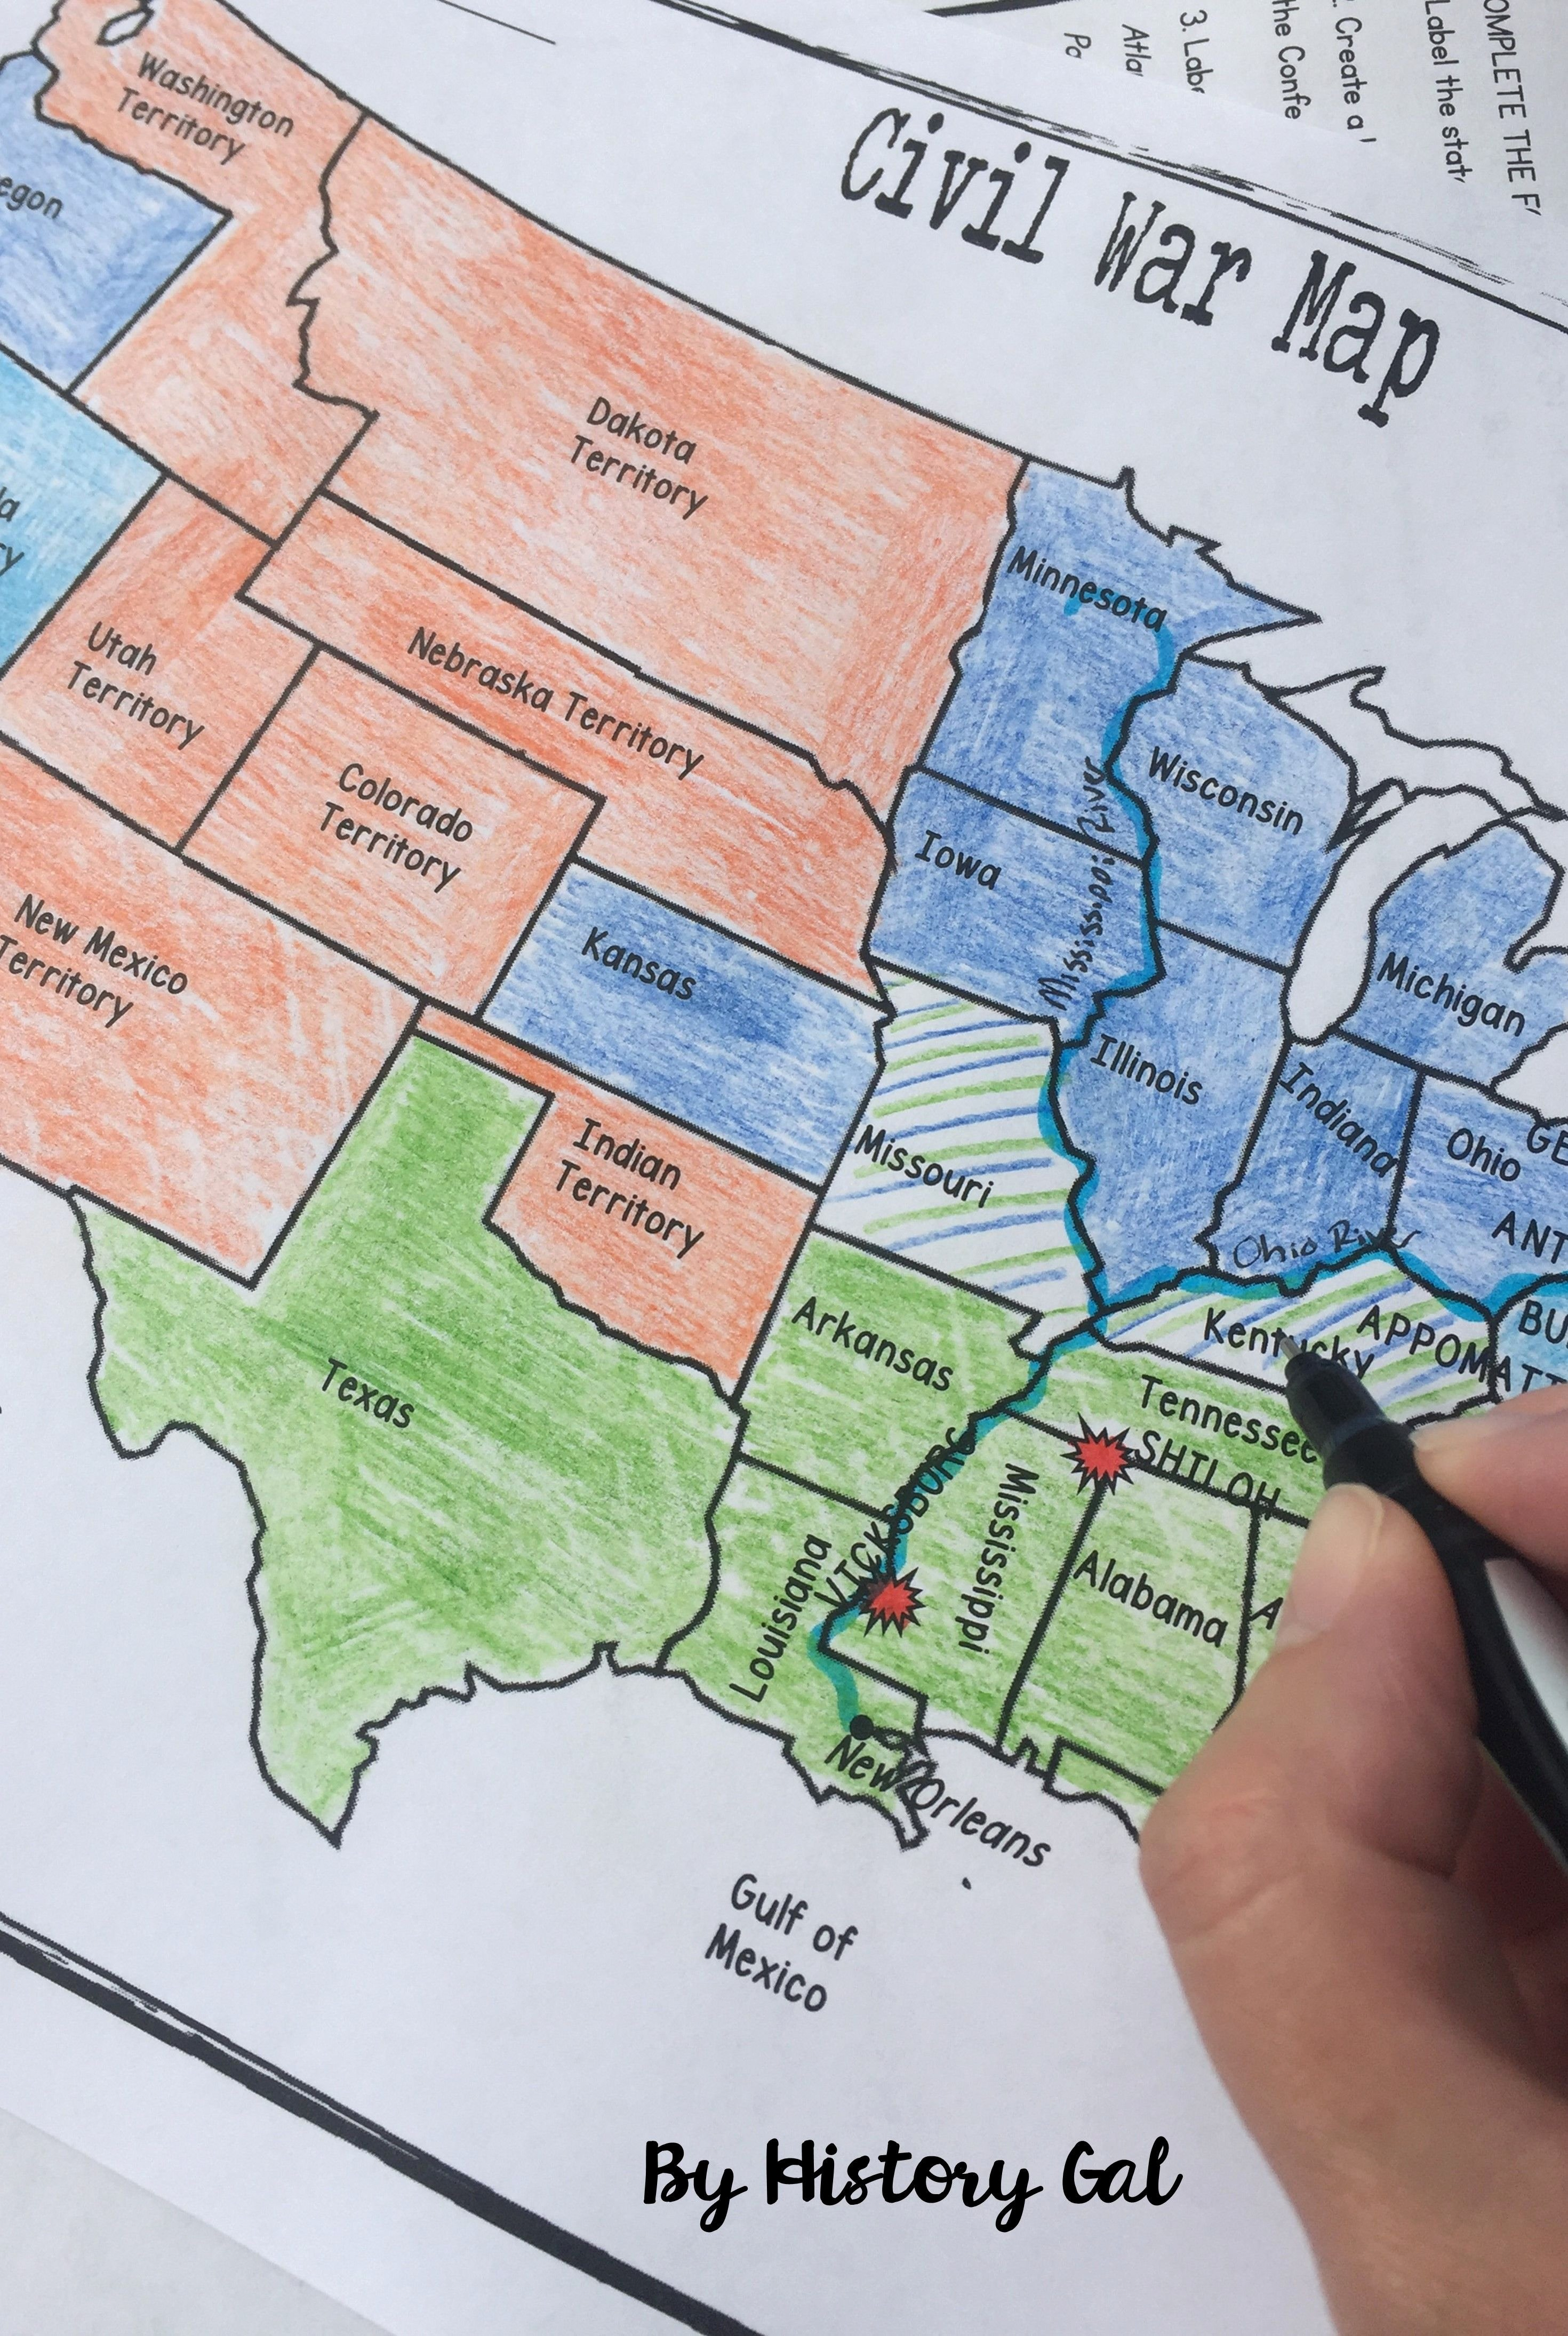 Civil War Battles Map Worksheet Unique Civil War Map Activity History Teacher